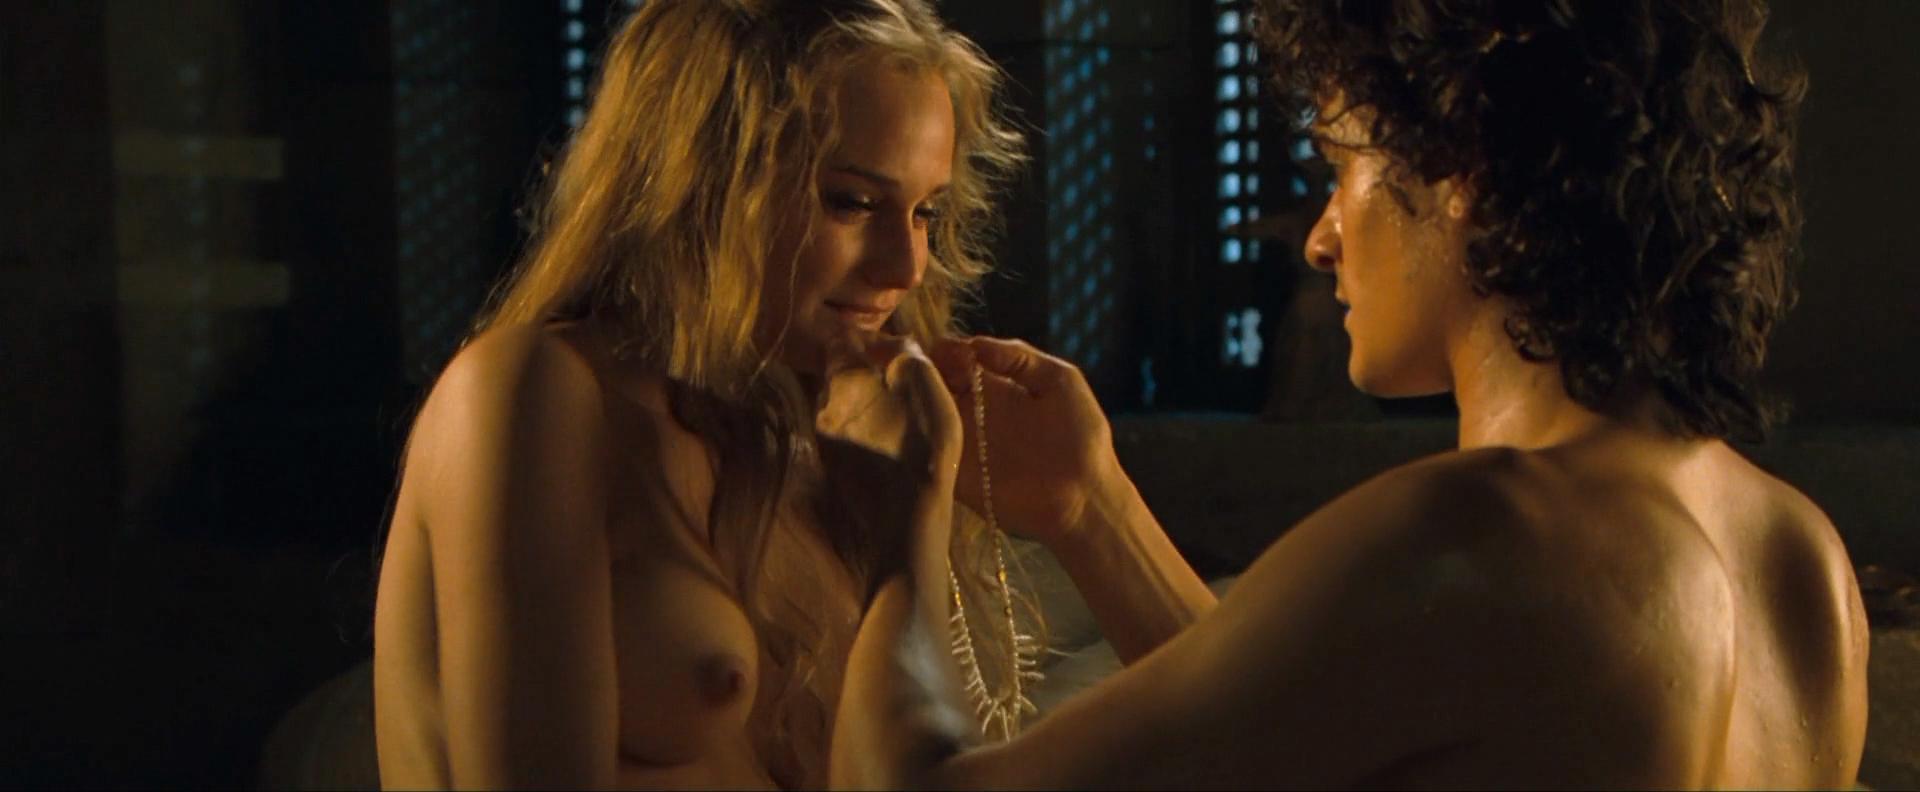 Diane Kruger sin censuras